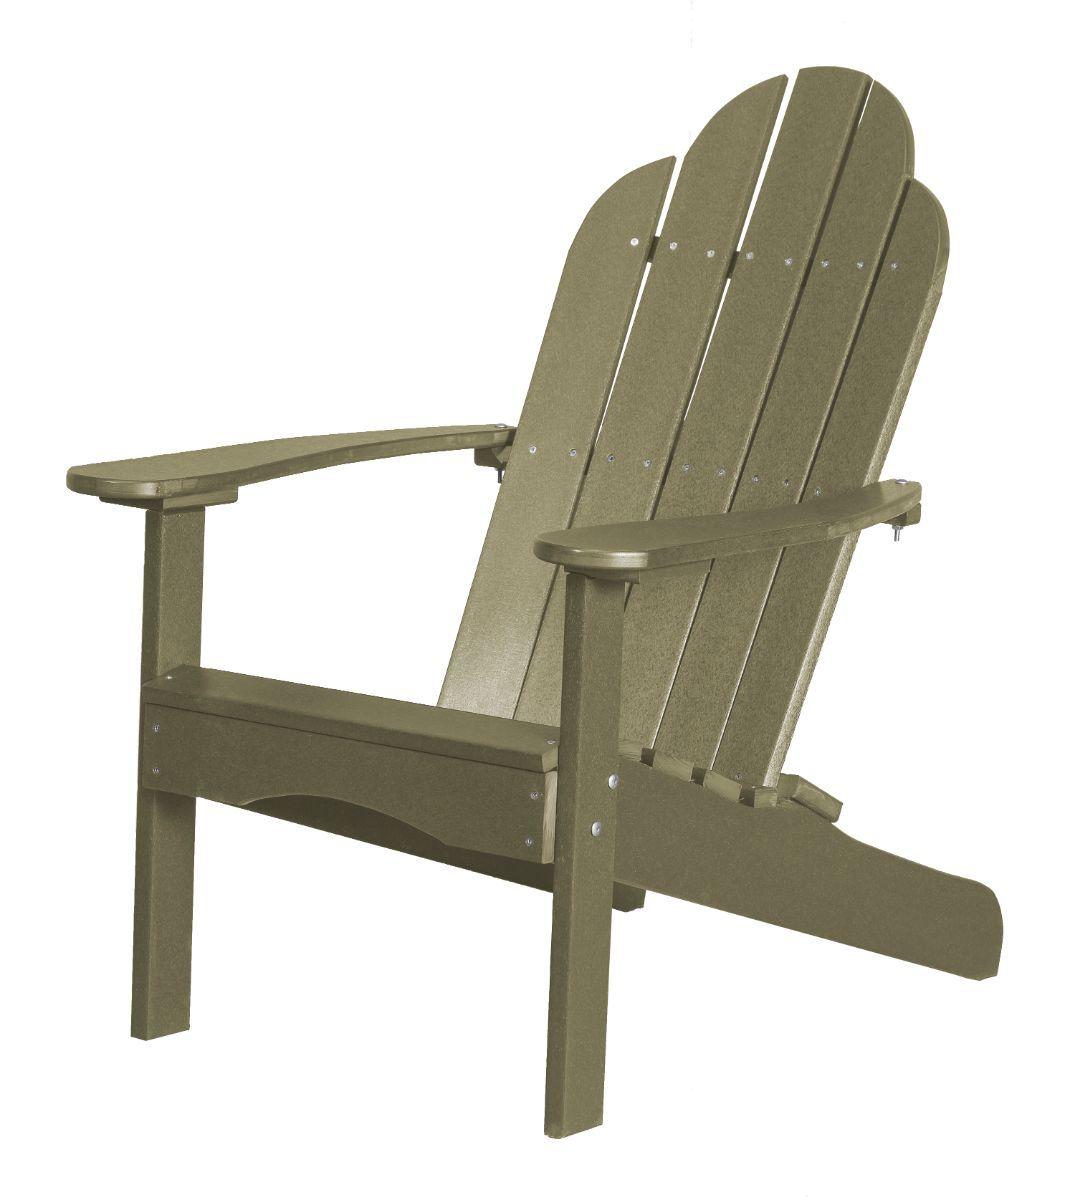 Olive Odessa Adirondack Chair